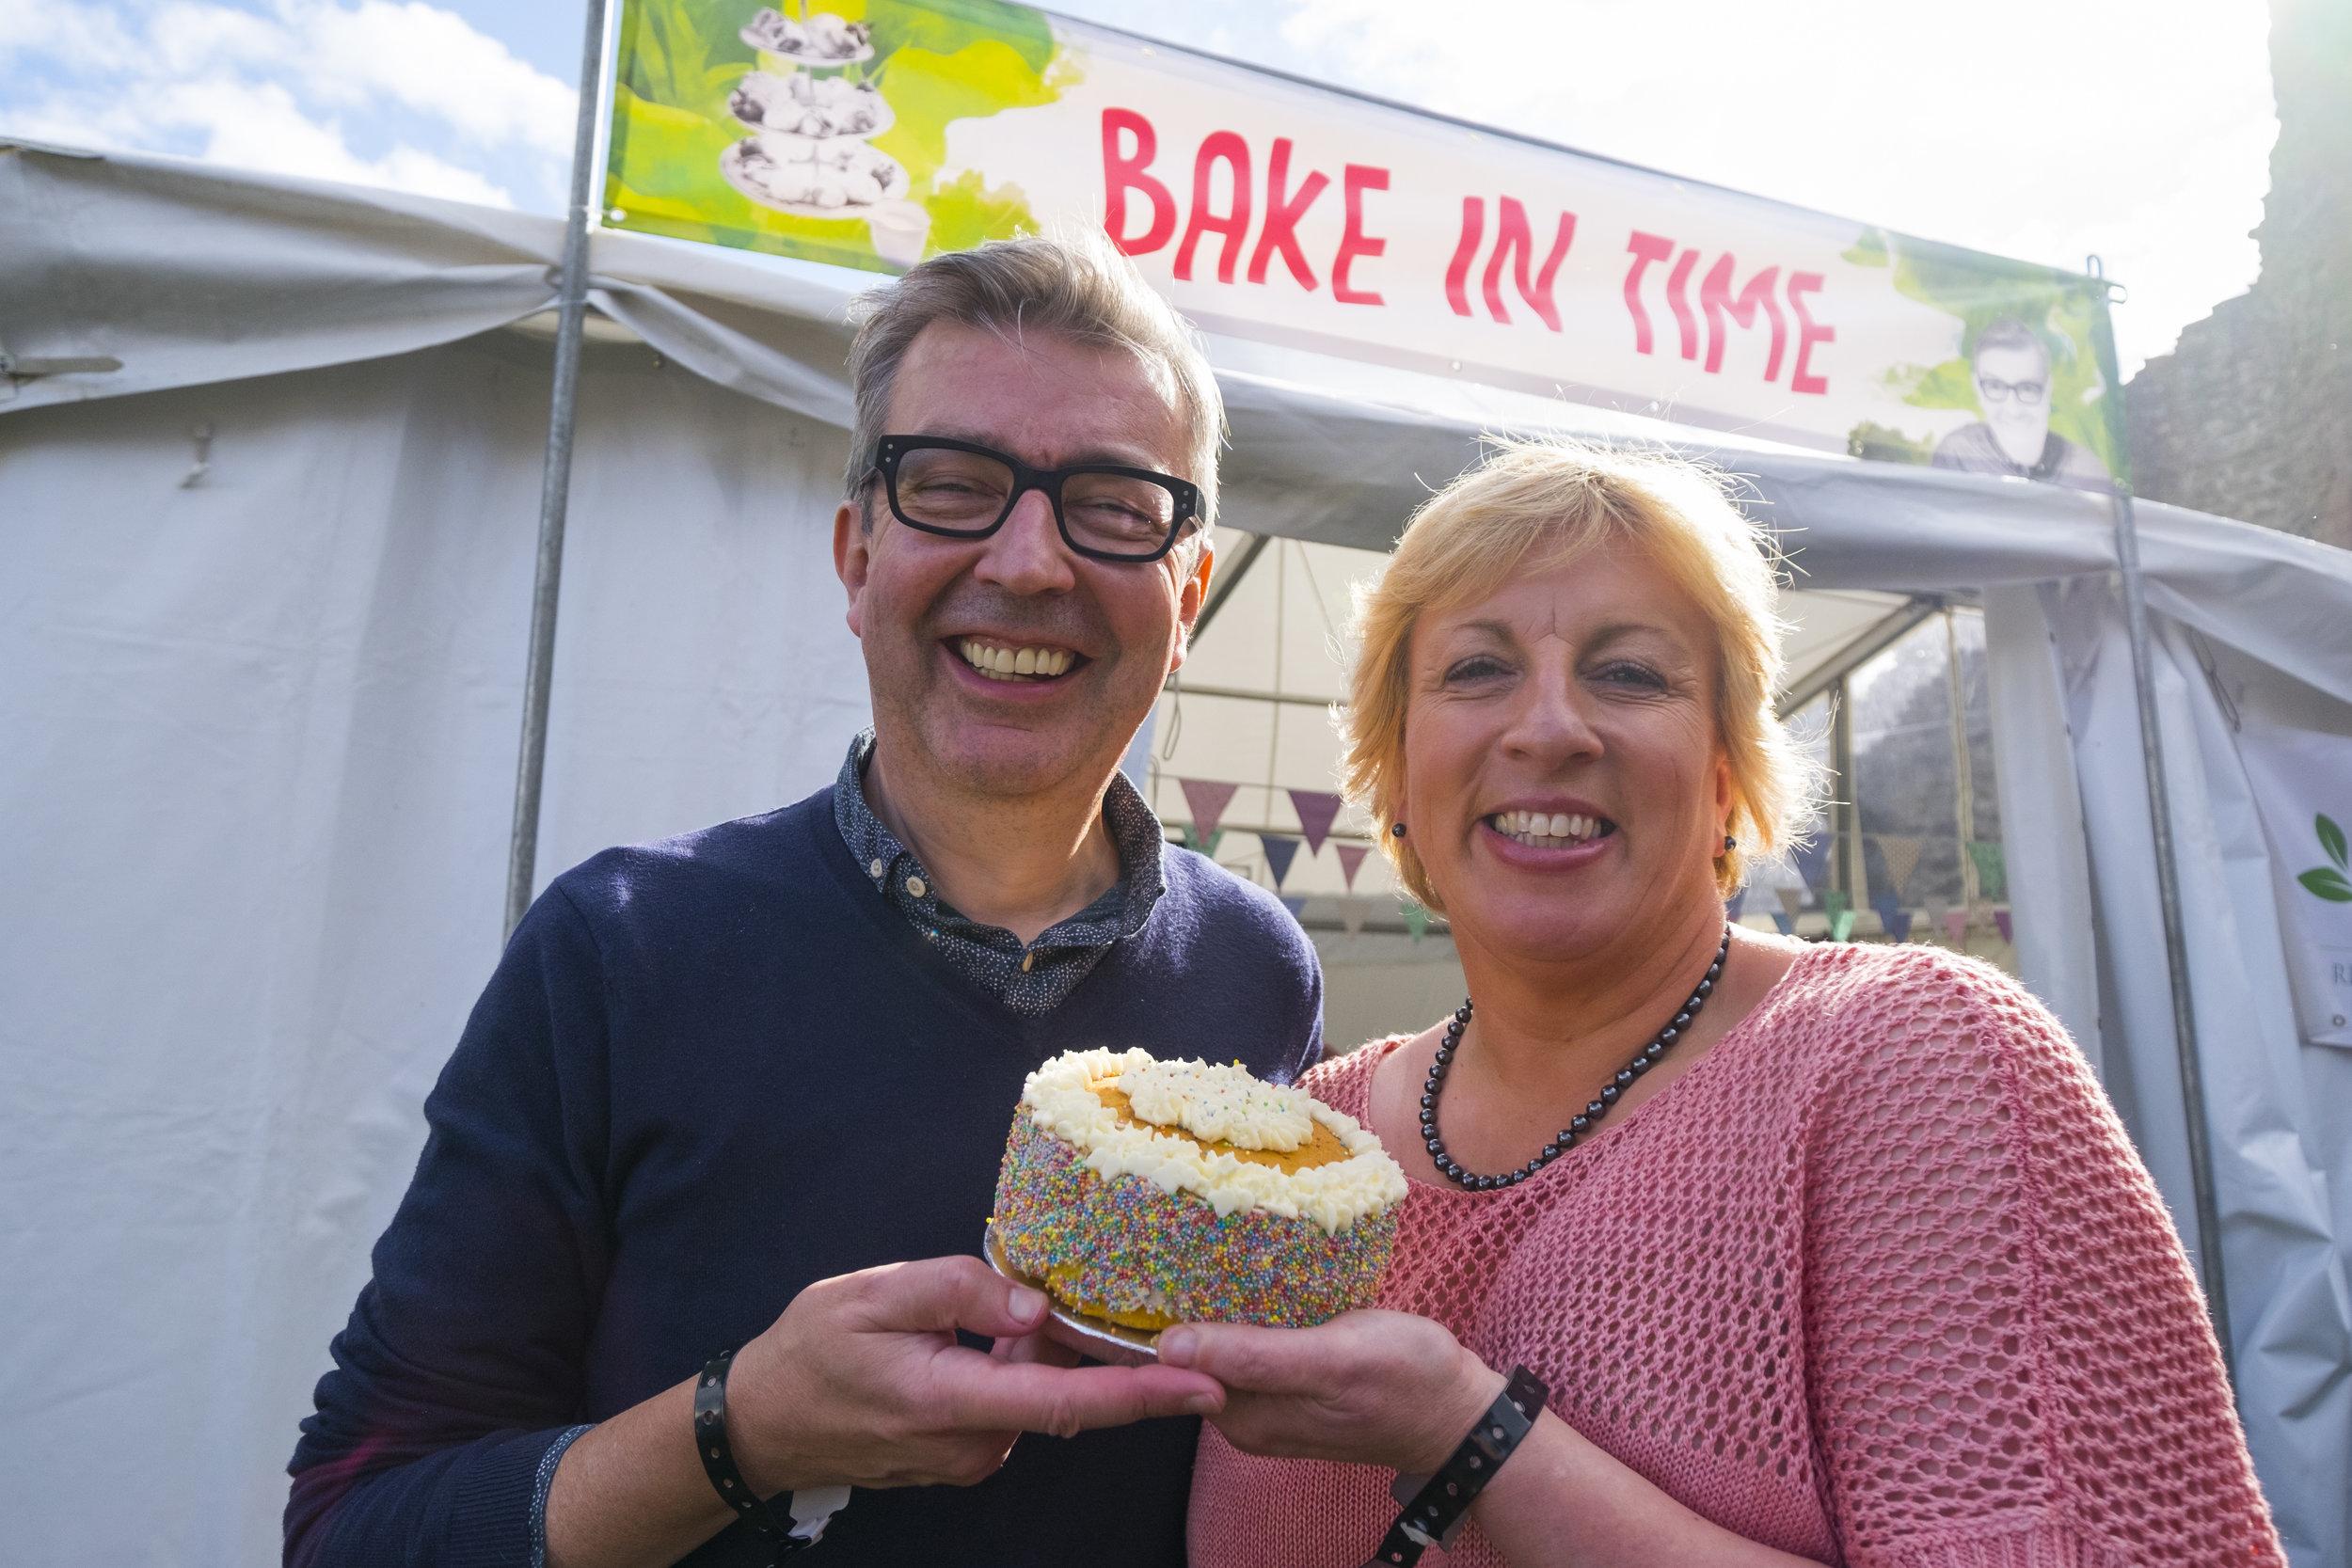 Howard Middleton, Sandy Docherty, Bake in Time Stage, Ludlow 2017 Food Festival.